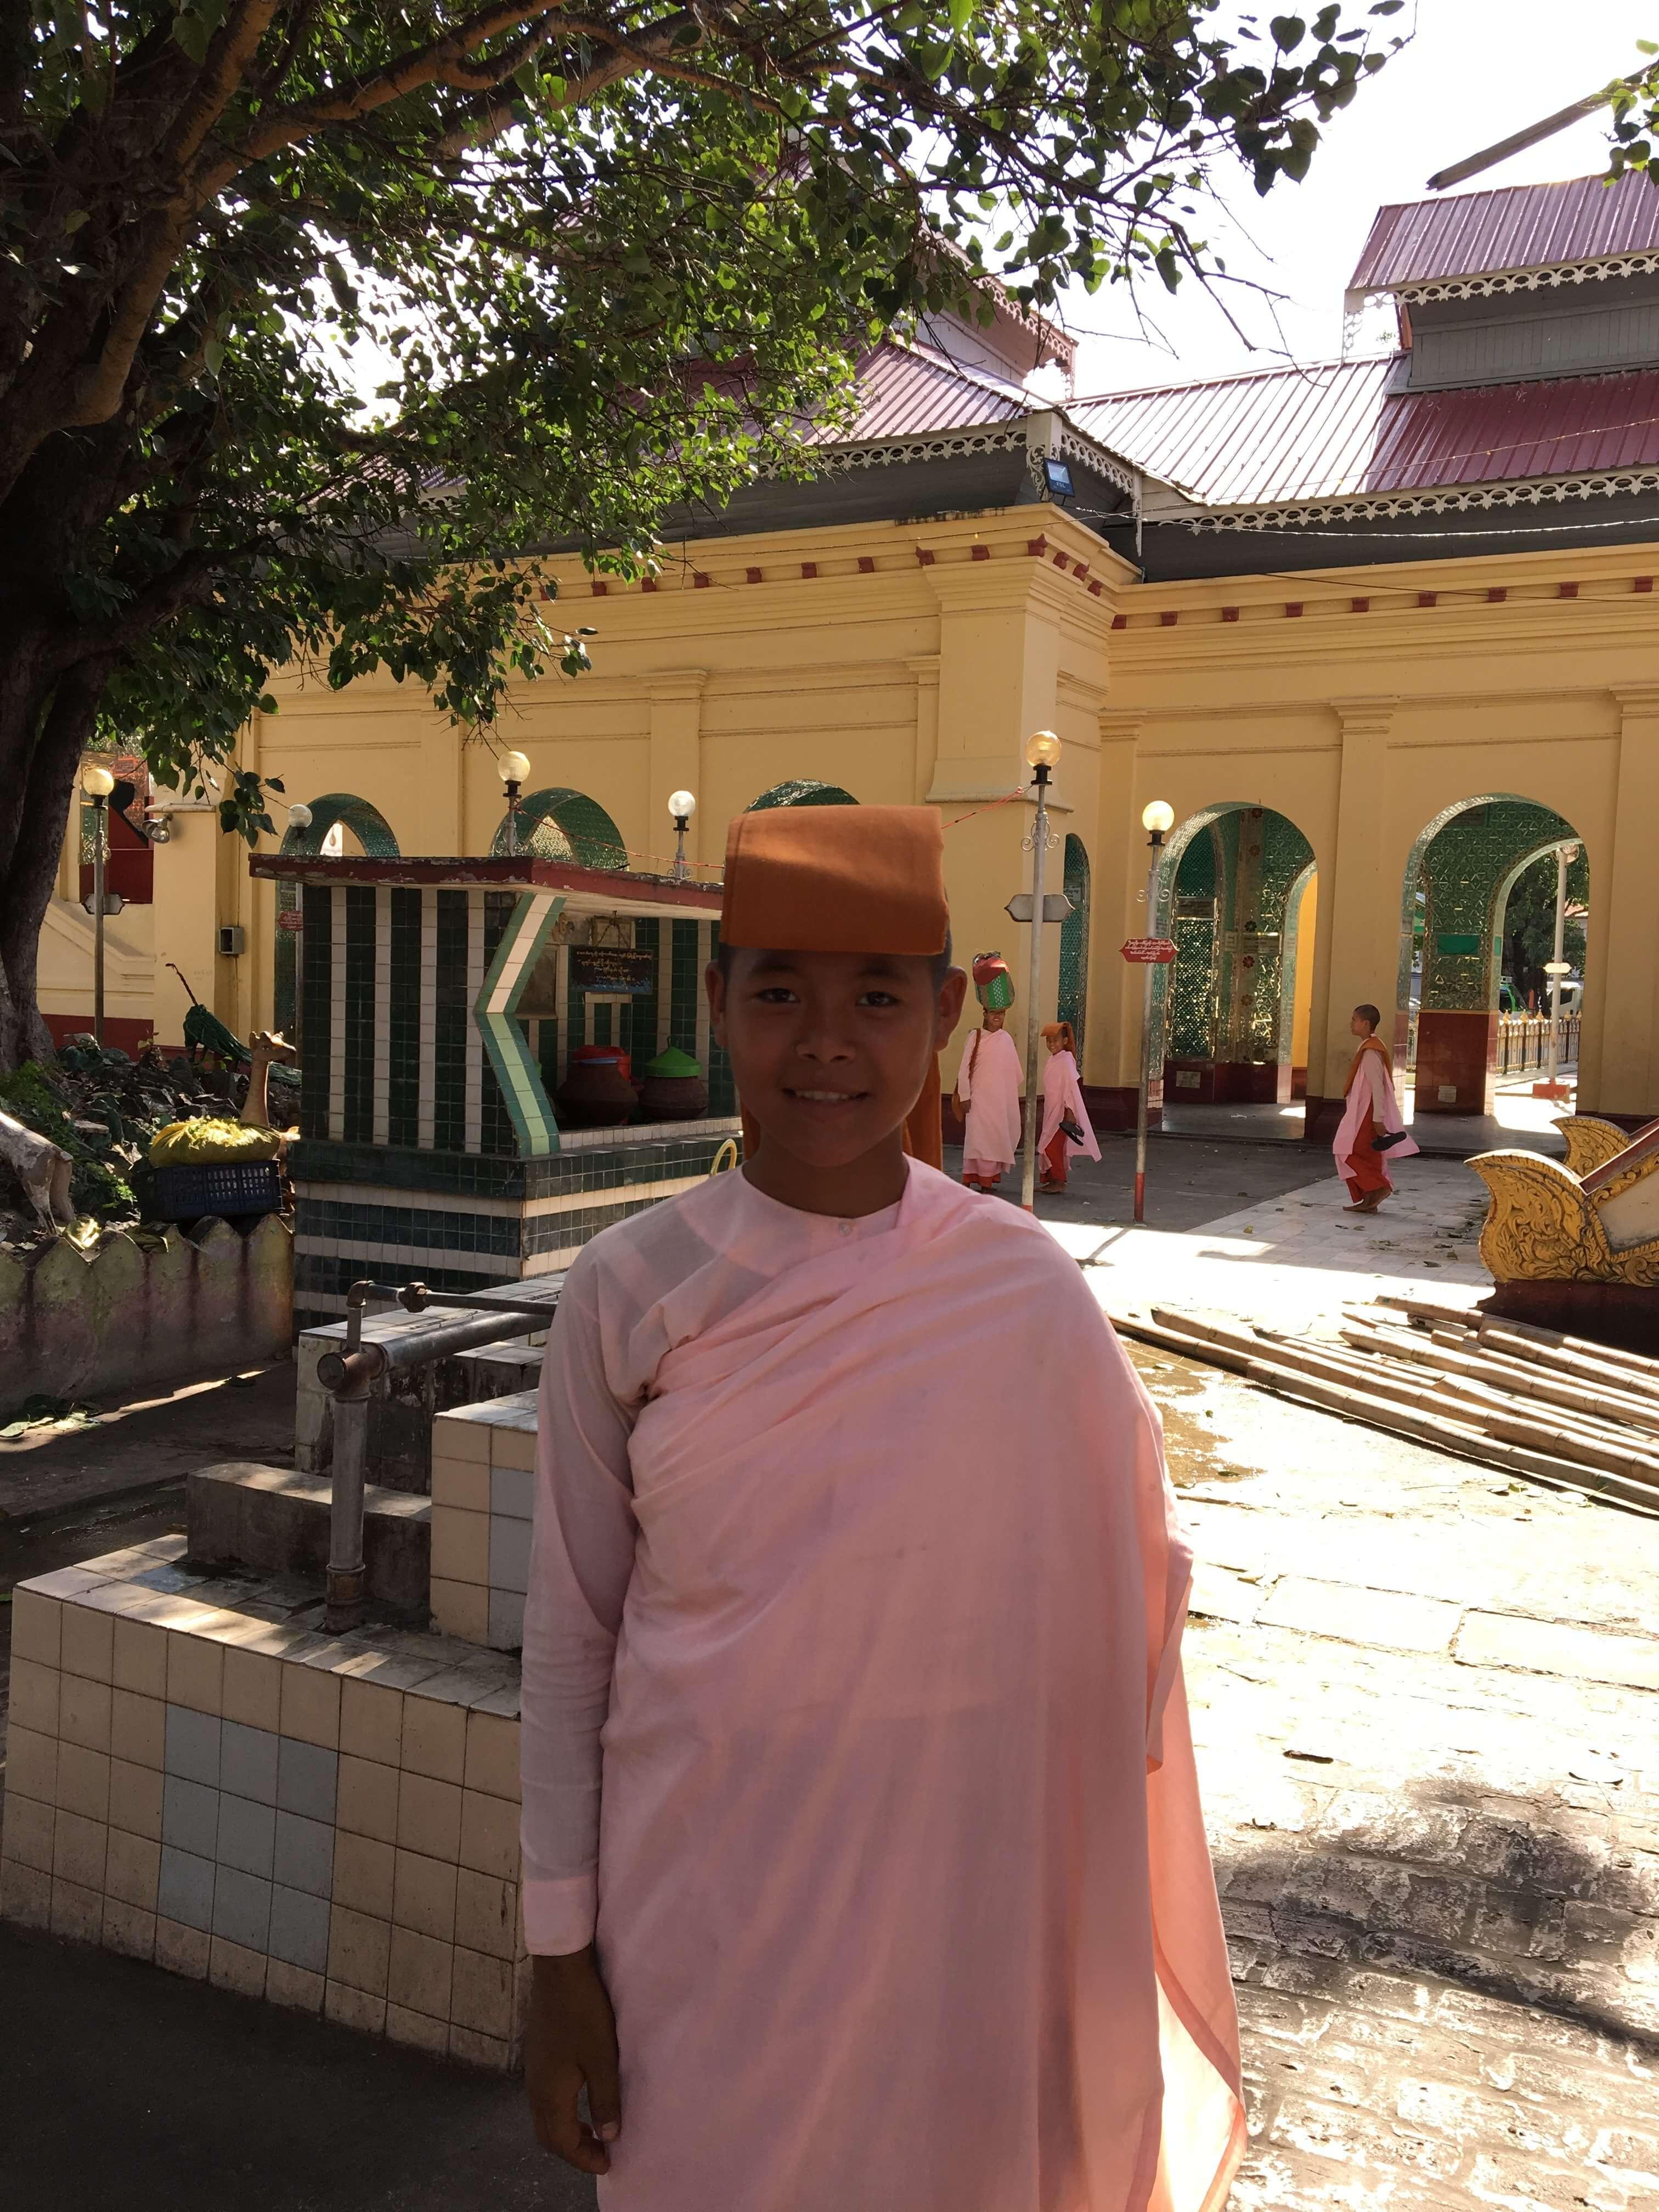 Setkyathiya pagoda, Mandalay, Myanmar (Burma)